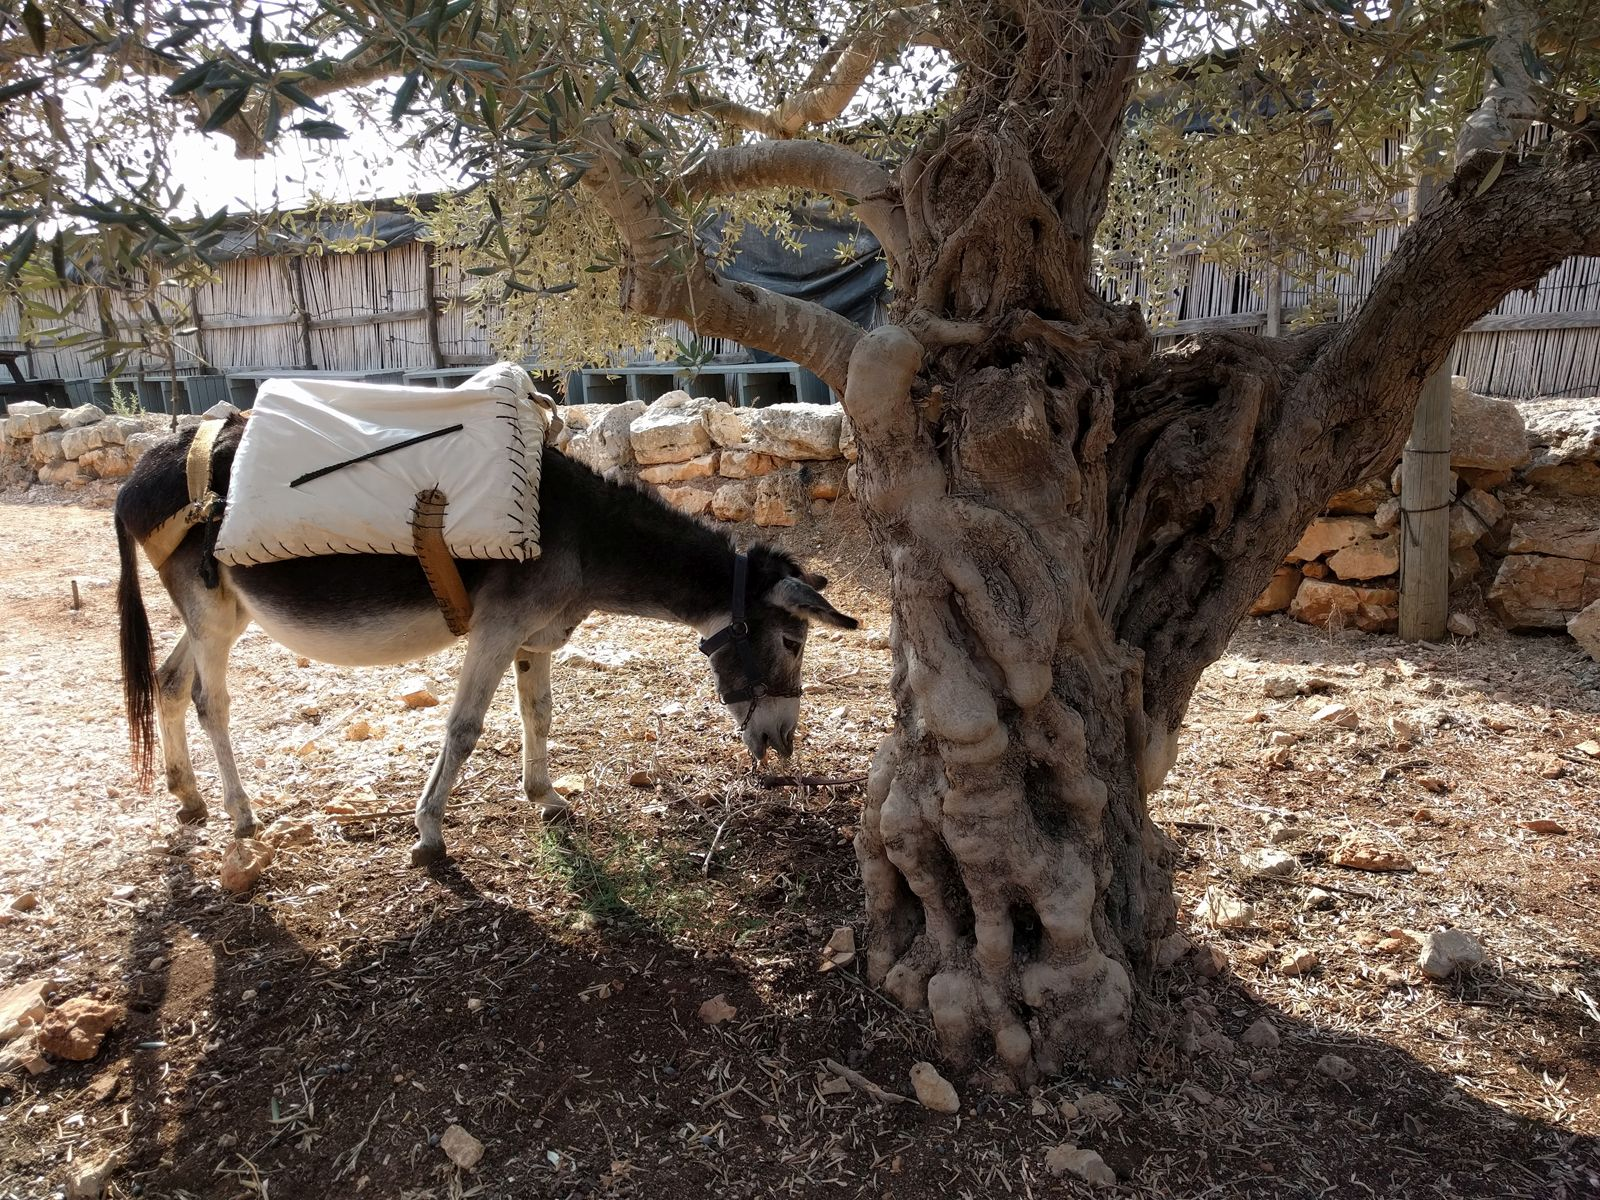 A resident donkey at Kfar Kedem. Photo by Viva Sarah Press